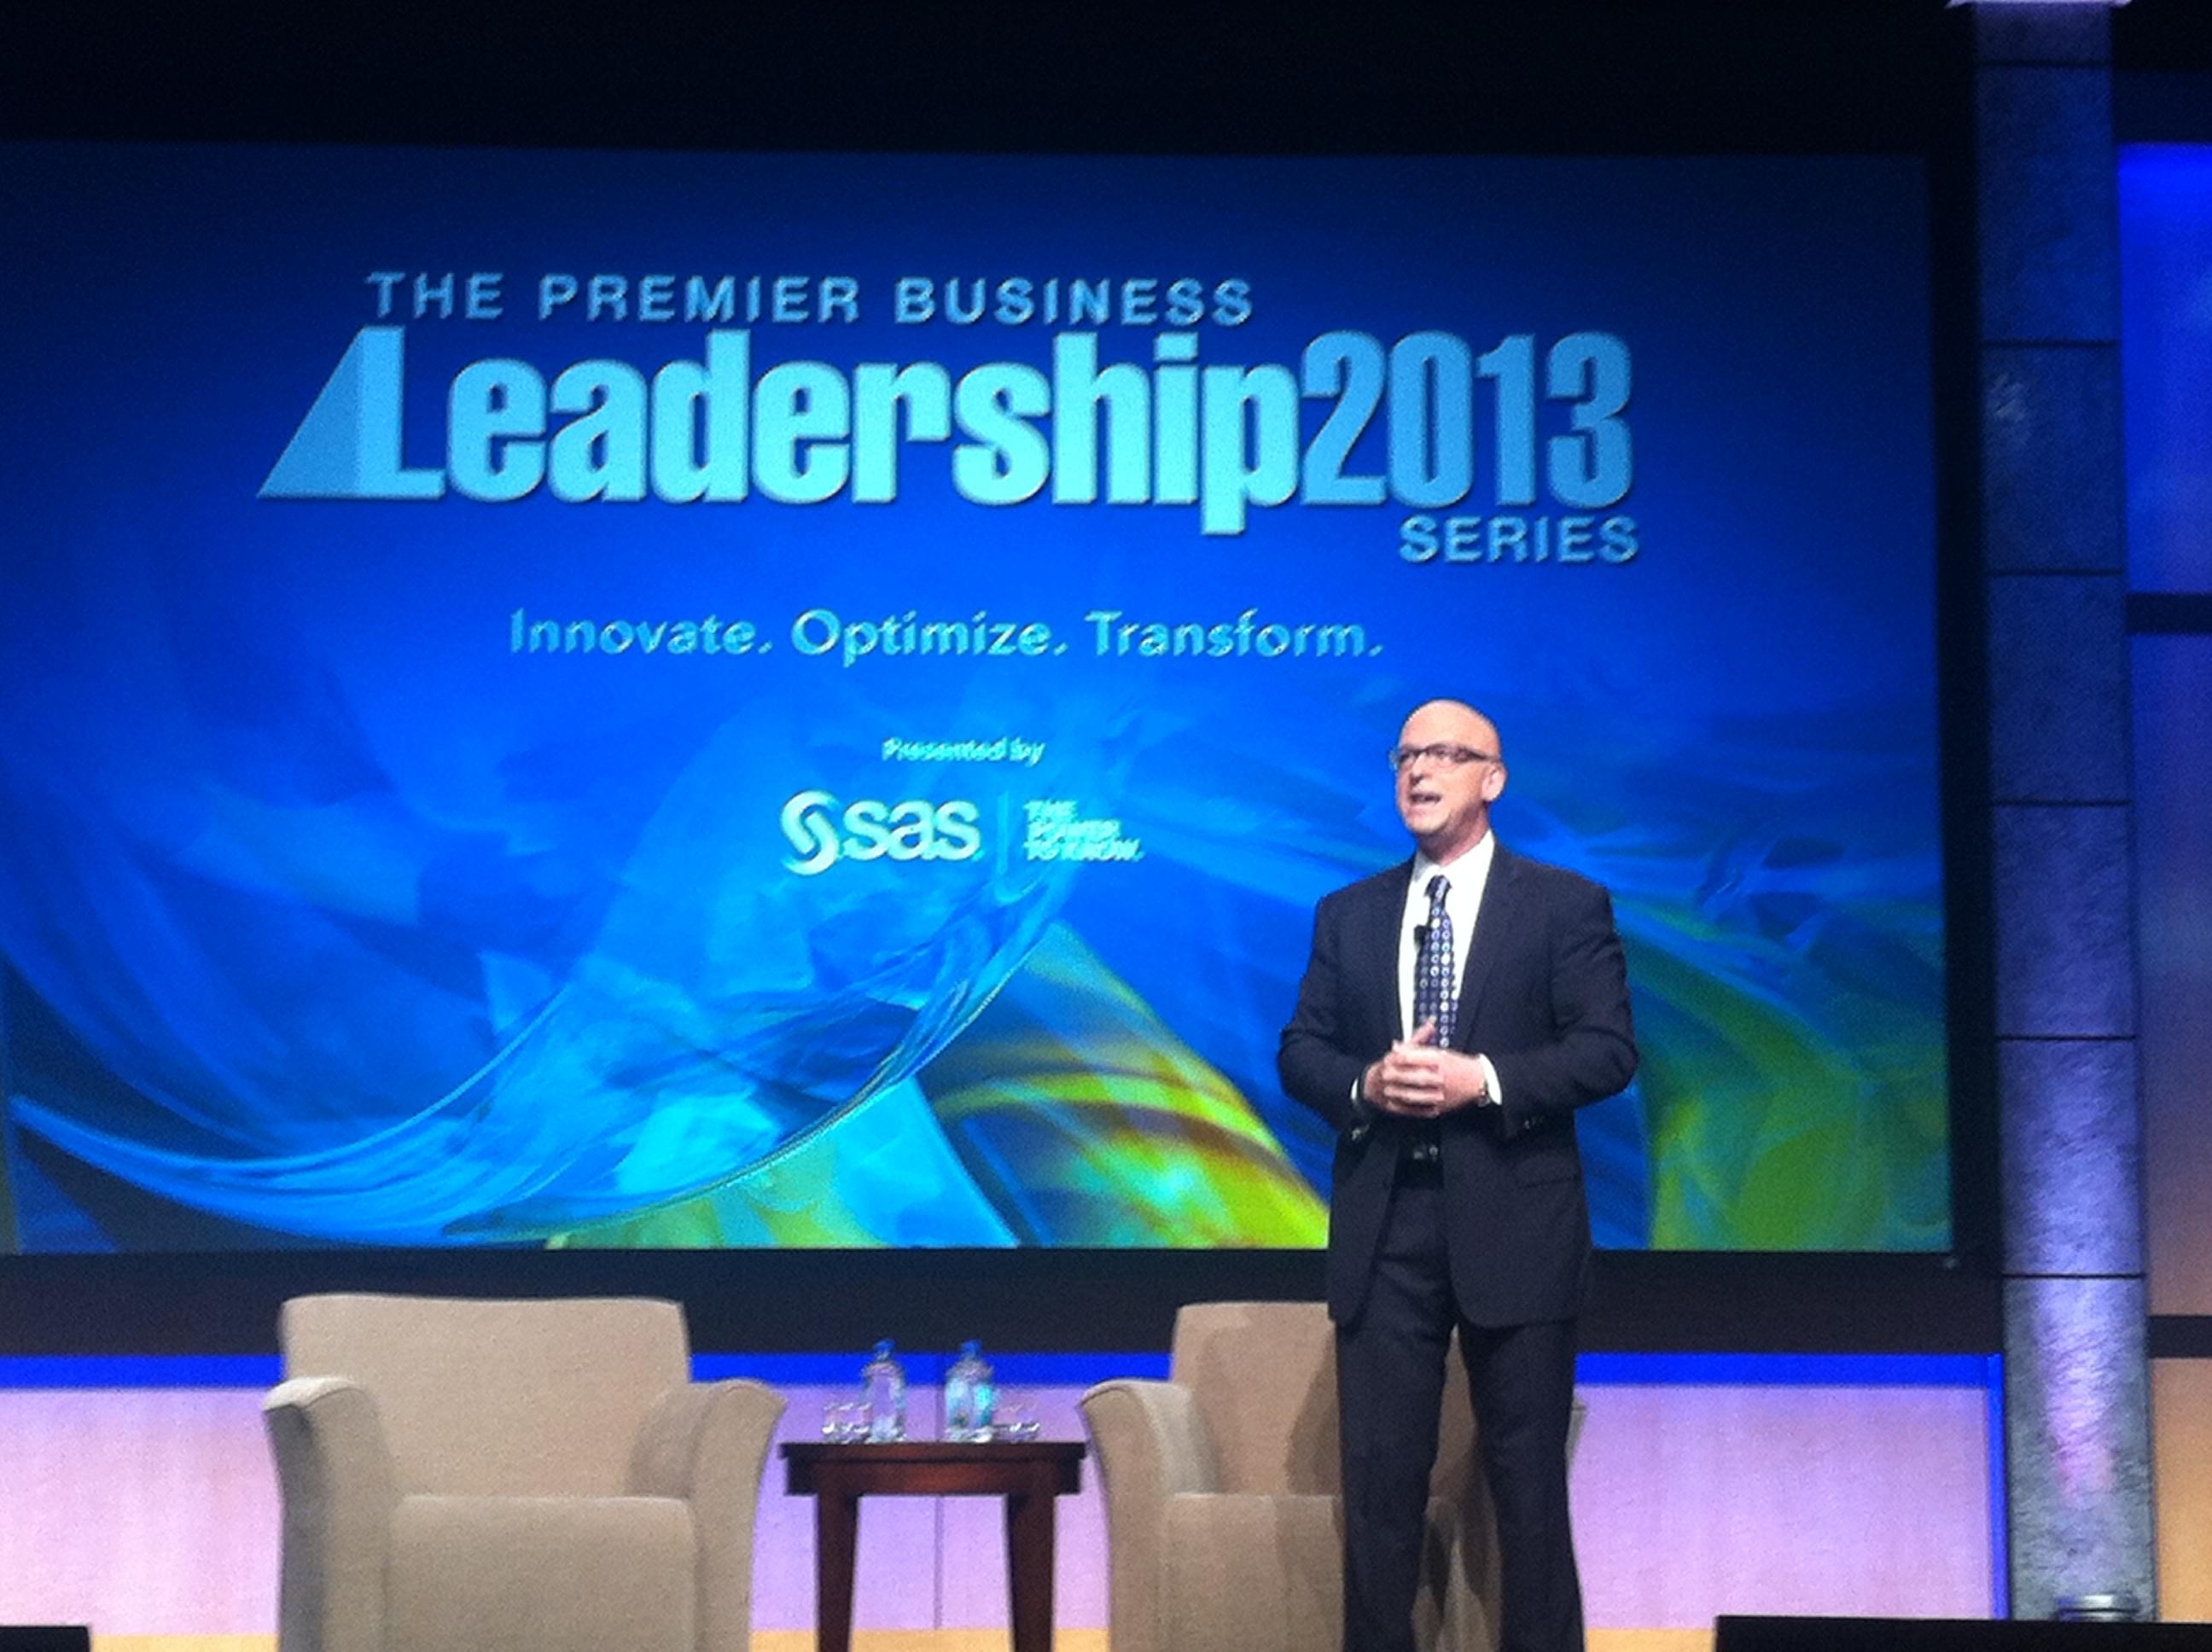 Mark Jeffries, Keynote speaker at the Premier Business Leadership Series conference.